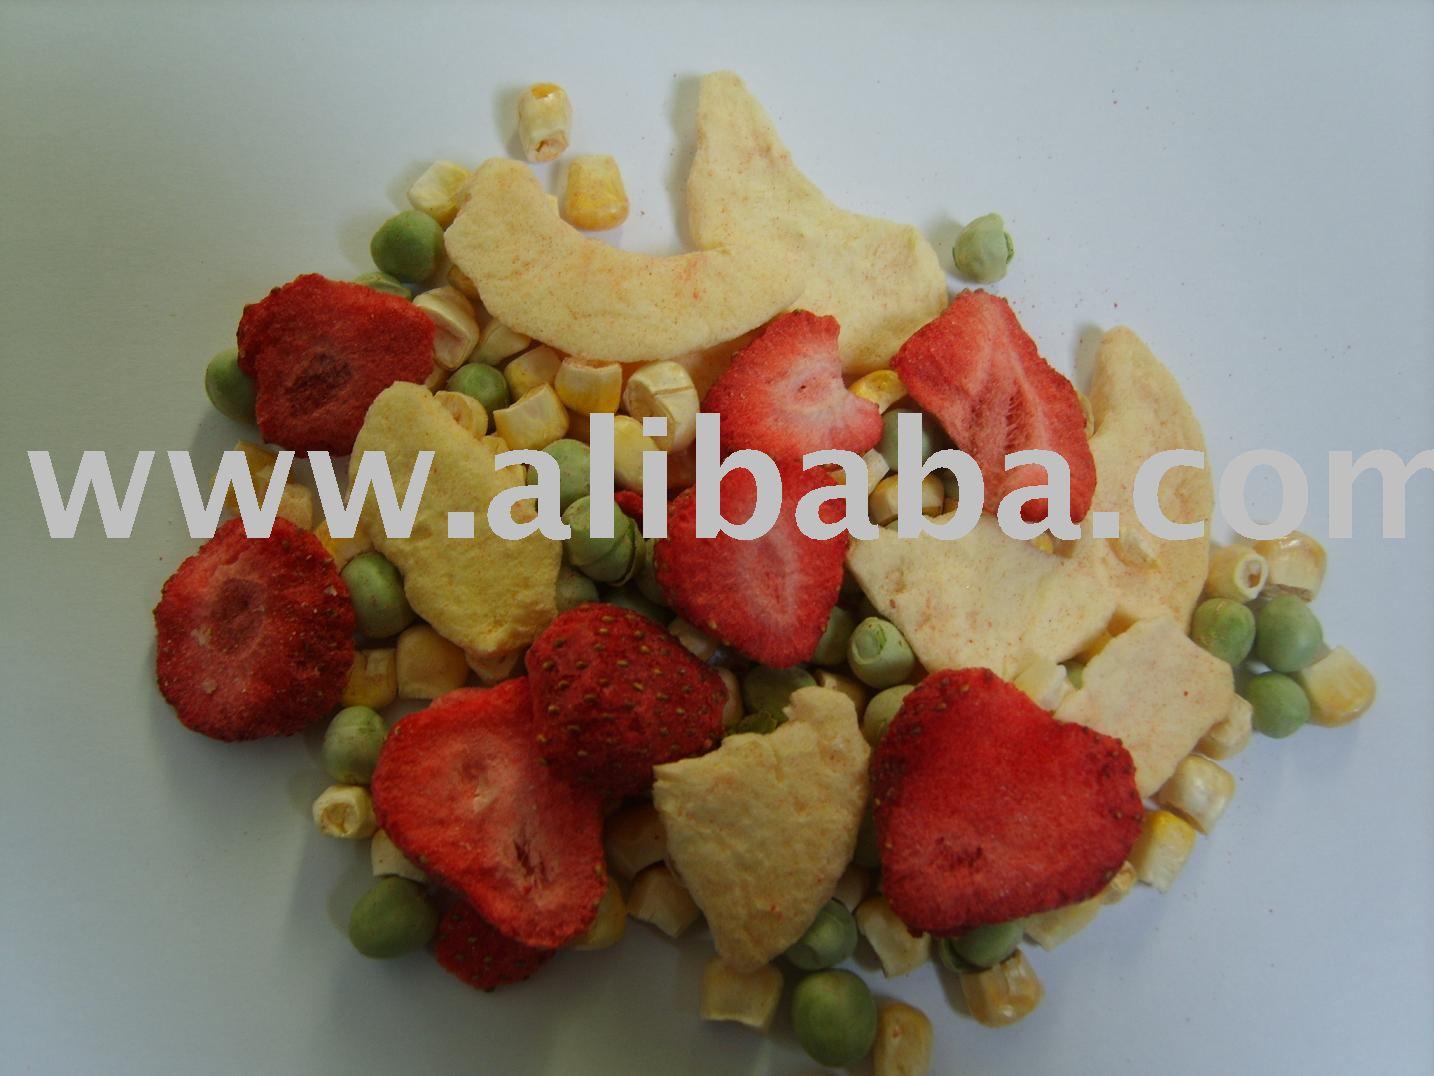 Freeze dried fruits singapore : Best alcohol free hand sanitizer